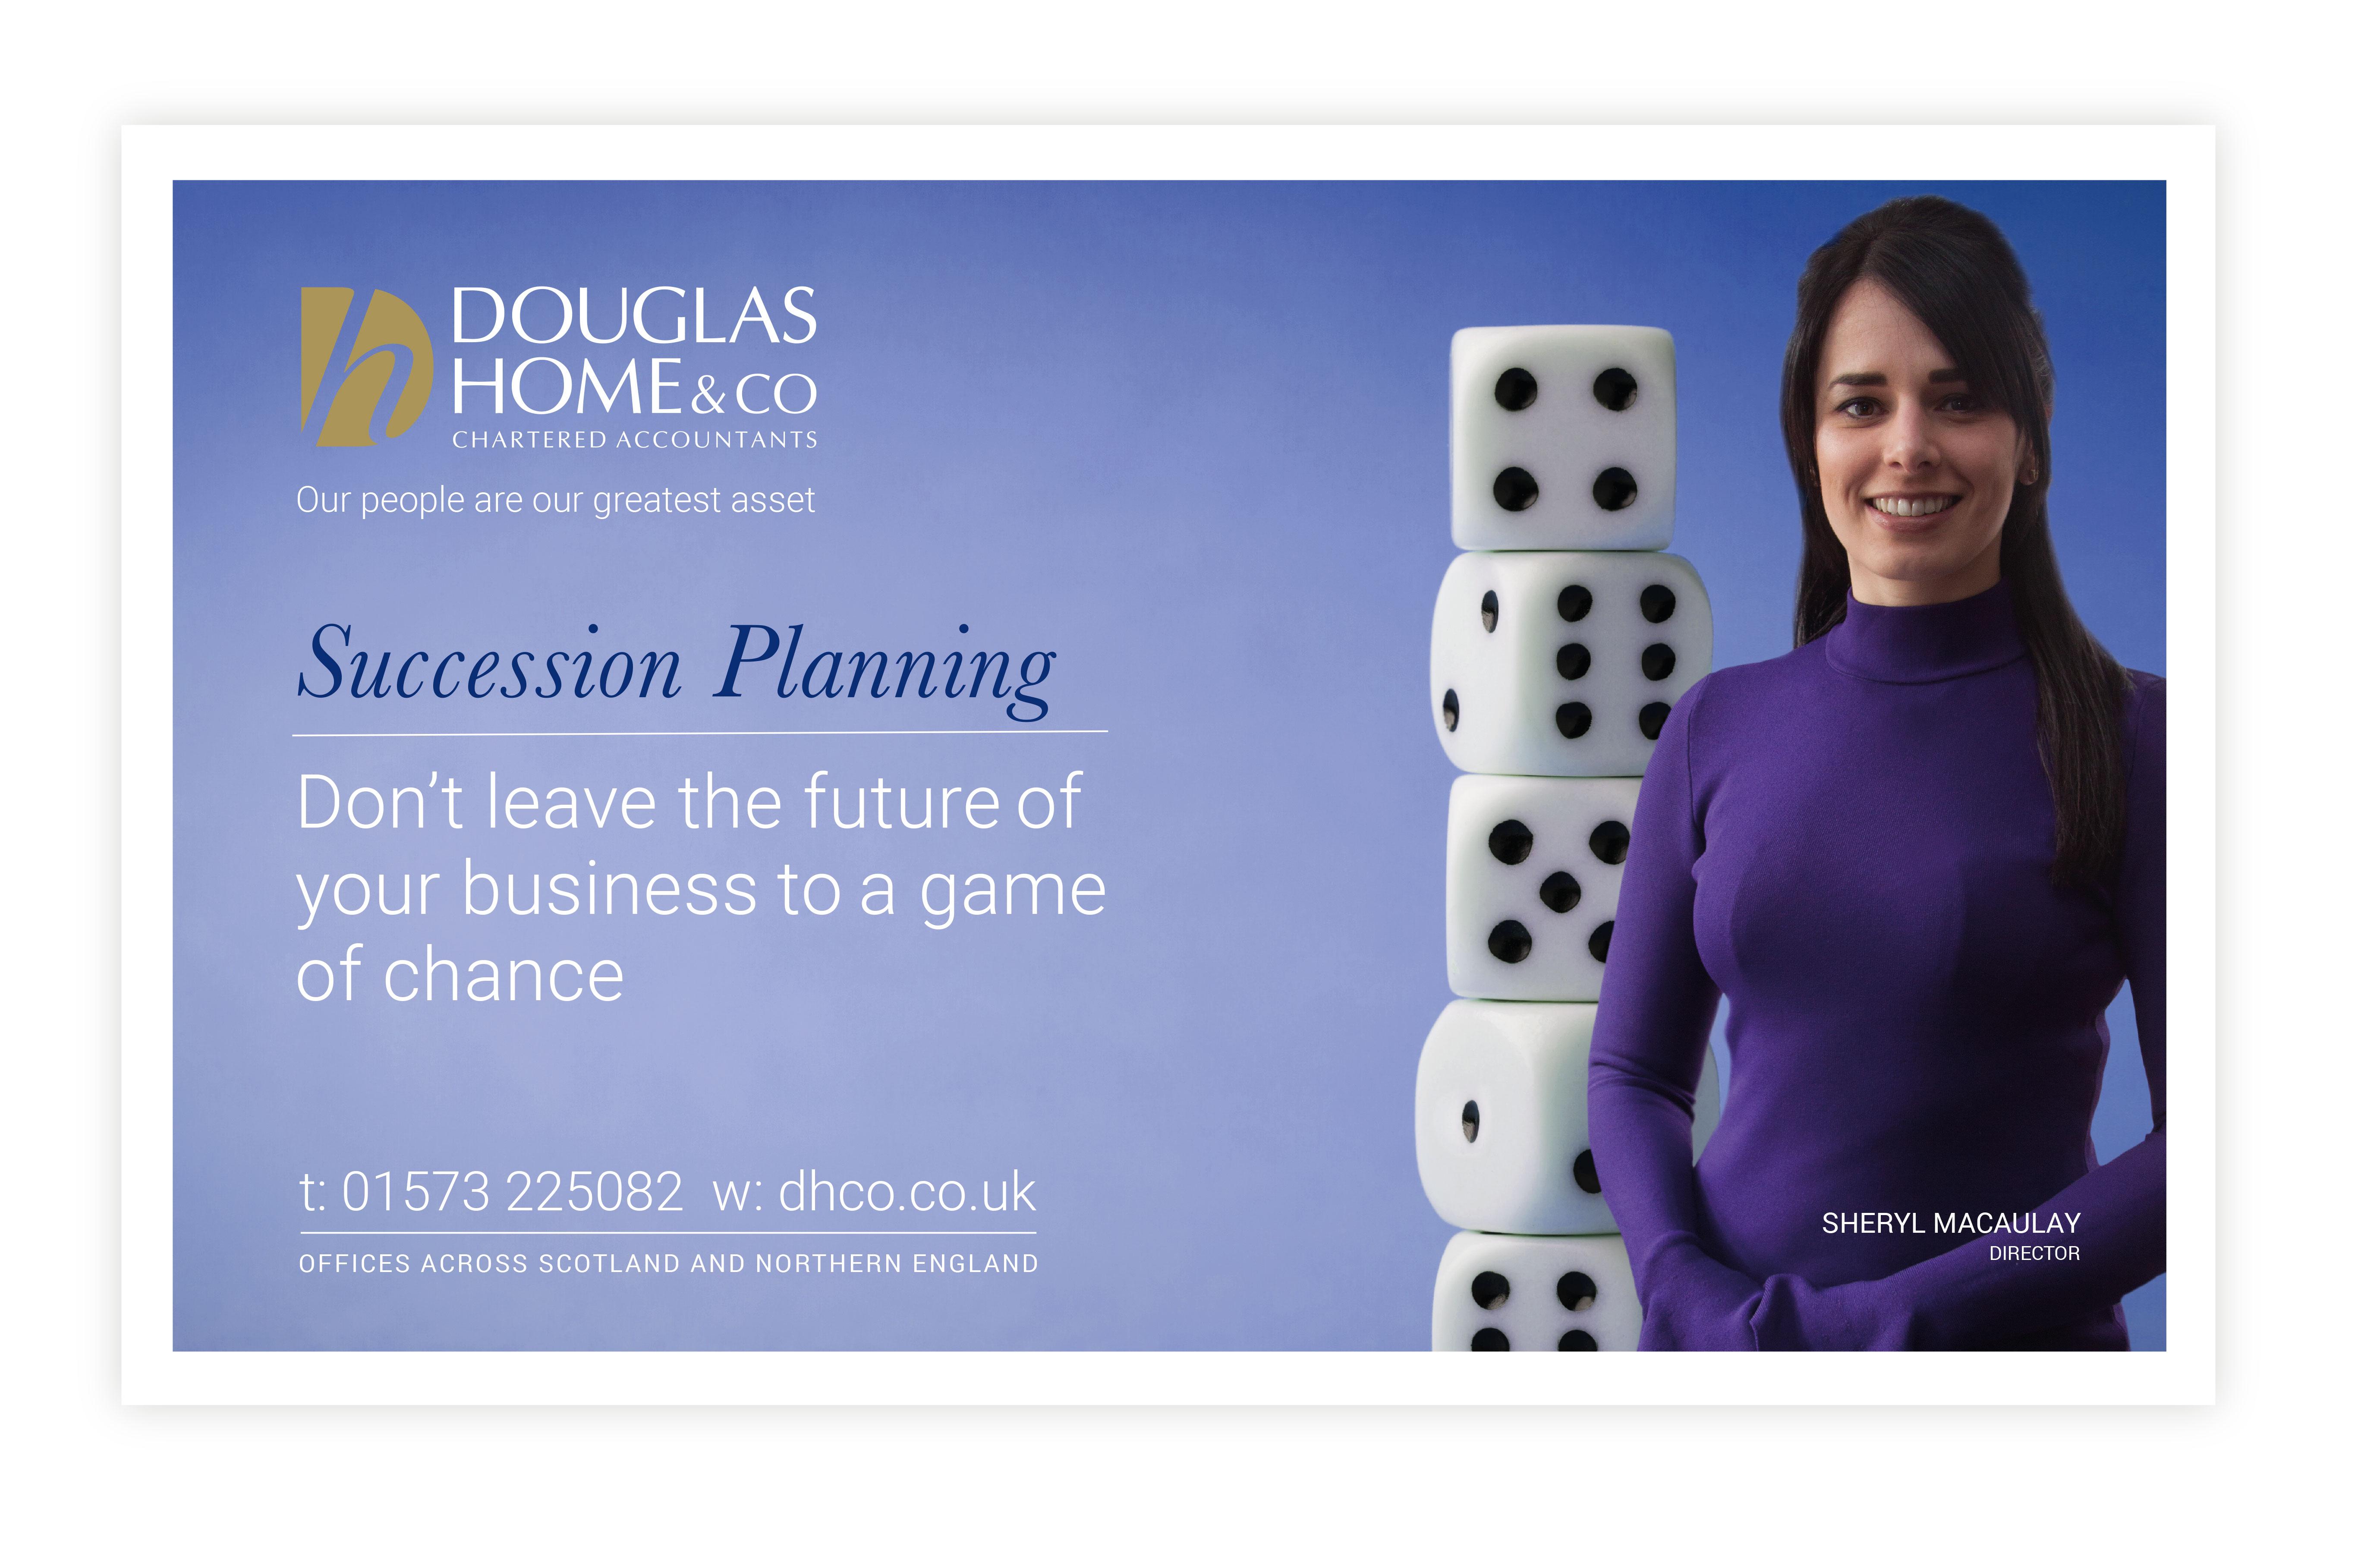 John Hamlin Douglas Home & Co Colour Ads